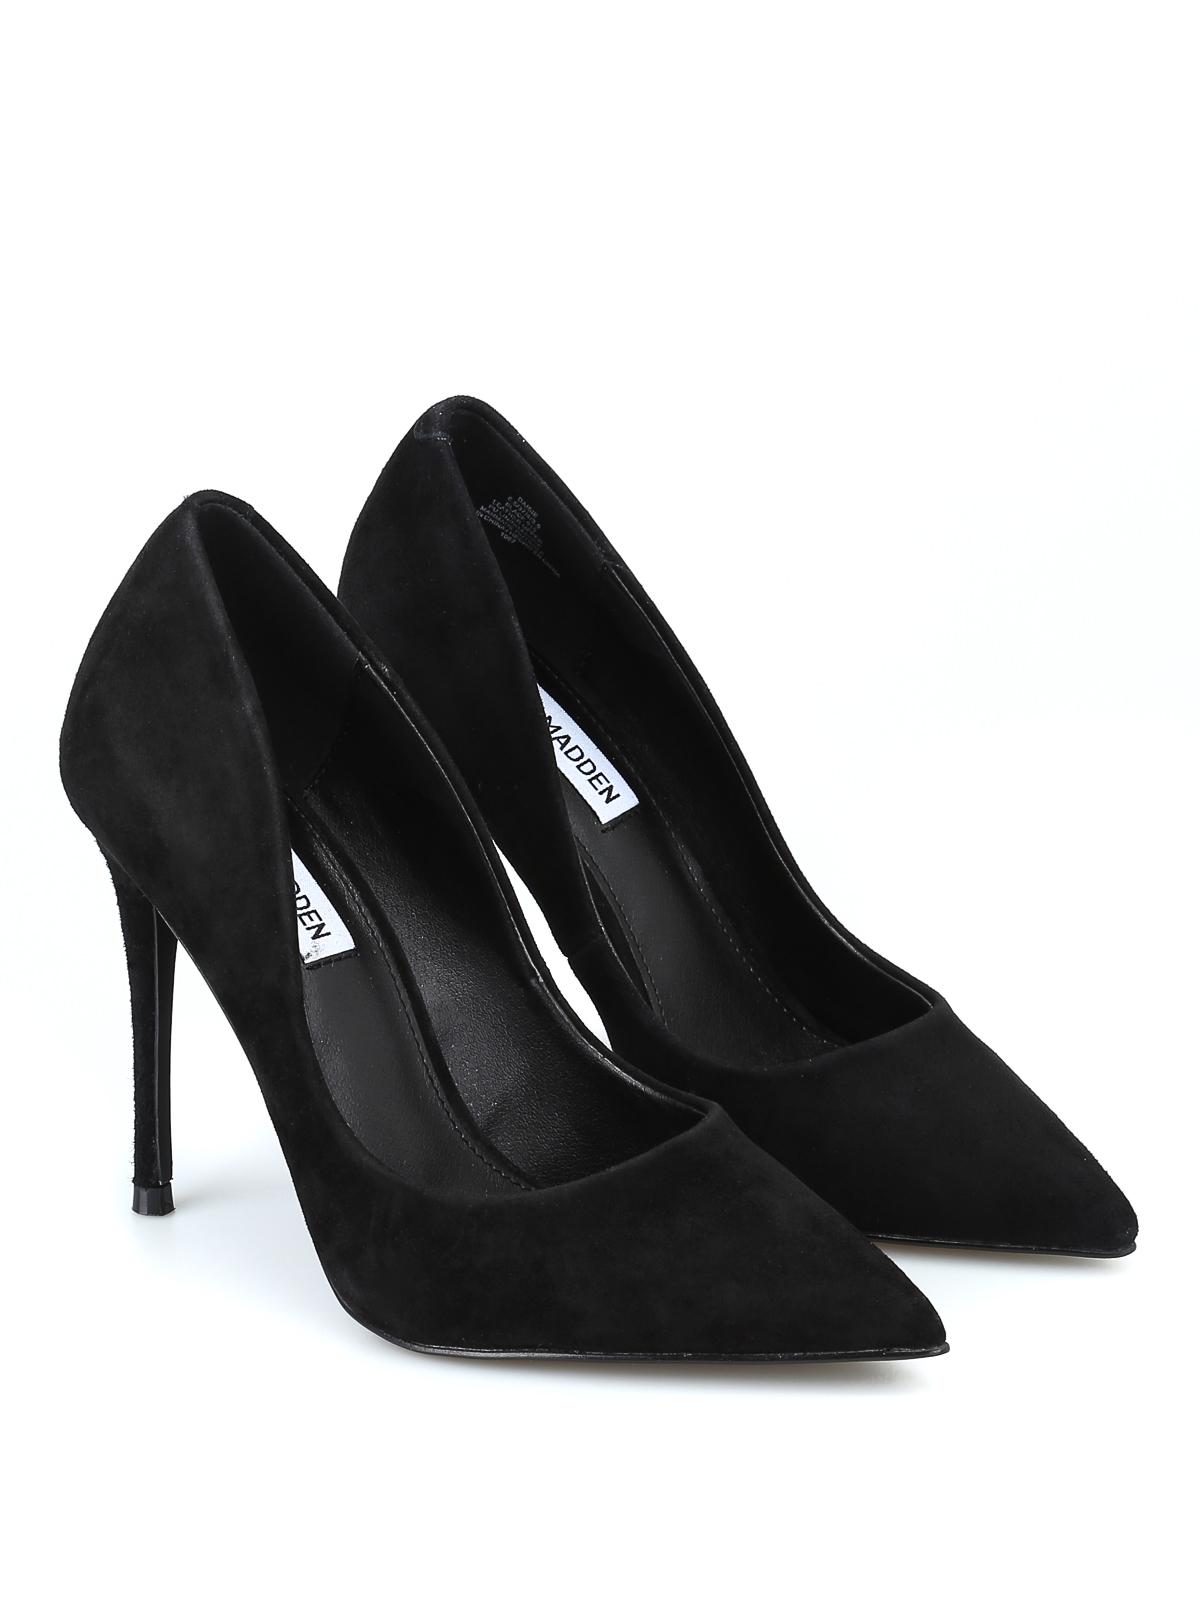 60f70f5562a Steve Madden - Daisie black suede pumps - court shoes - DAISIESUEDEBLACK